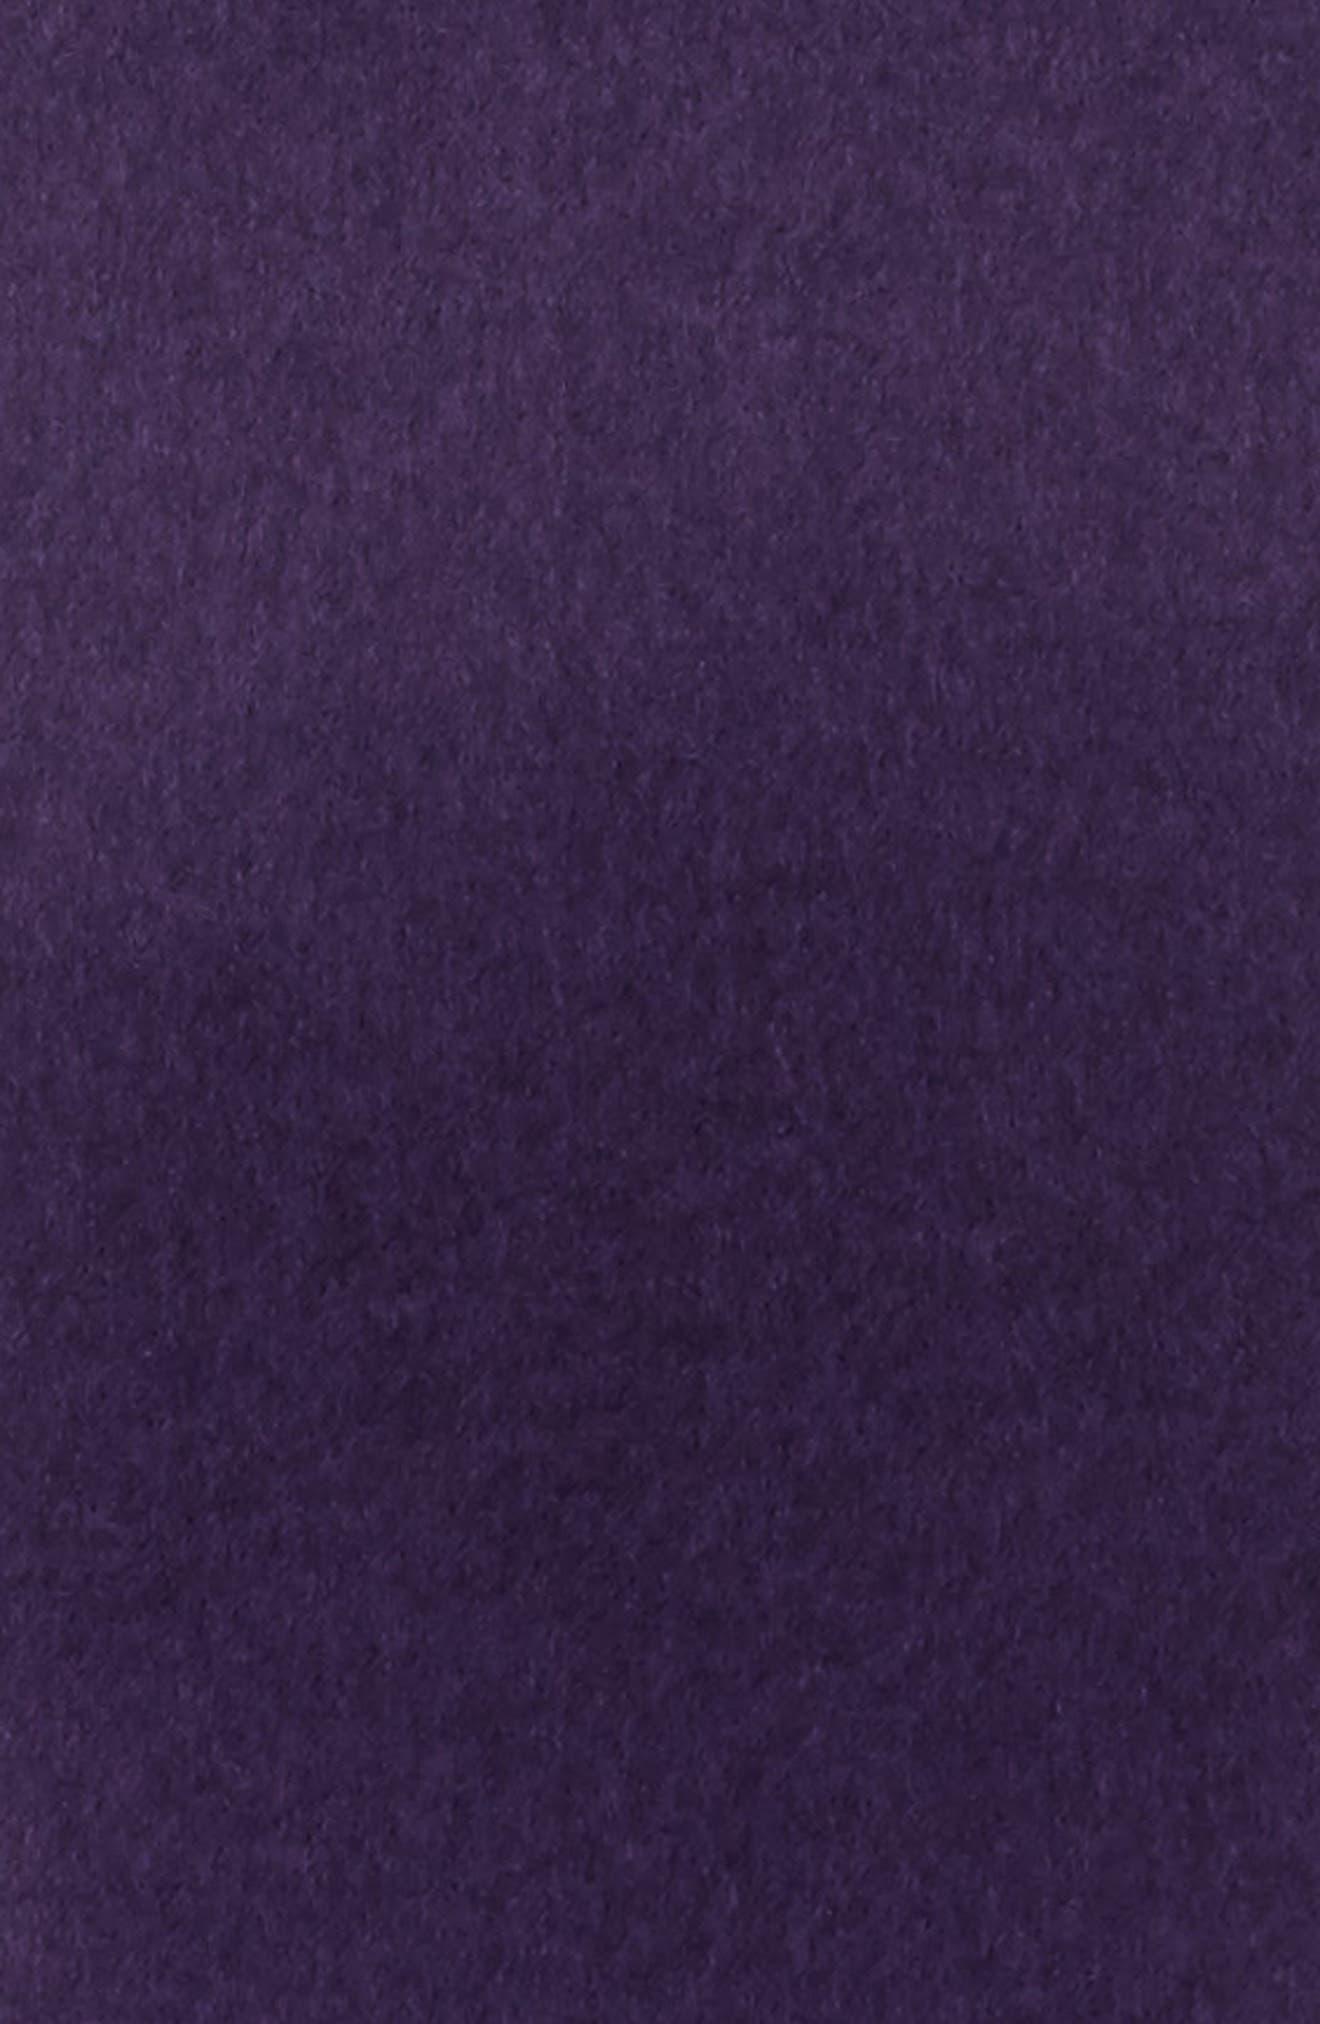 Guccy Sequin Silk & Cashmere Scarf,                             Alternate thumbnail 4, color,                             PARMA VIOLET